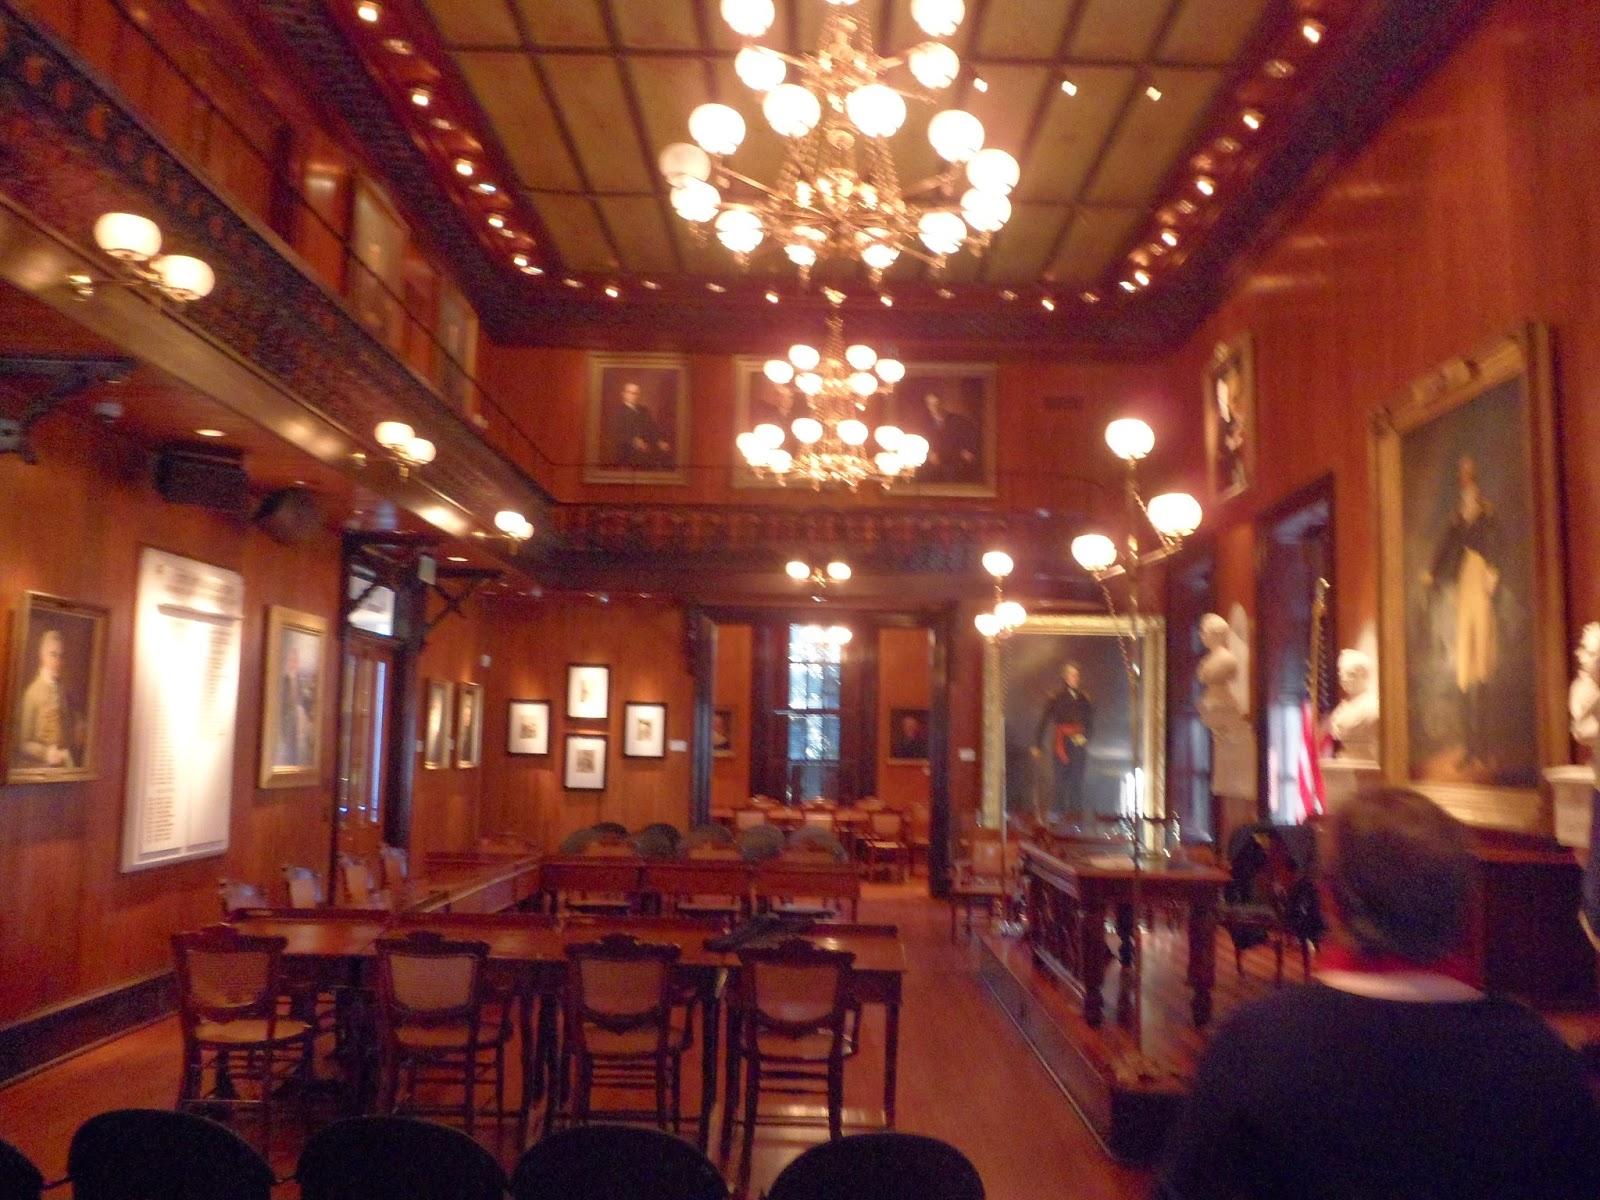 jfk 50 historic city council chamber of charleston sc